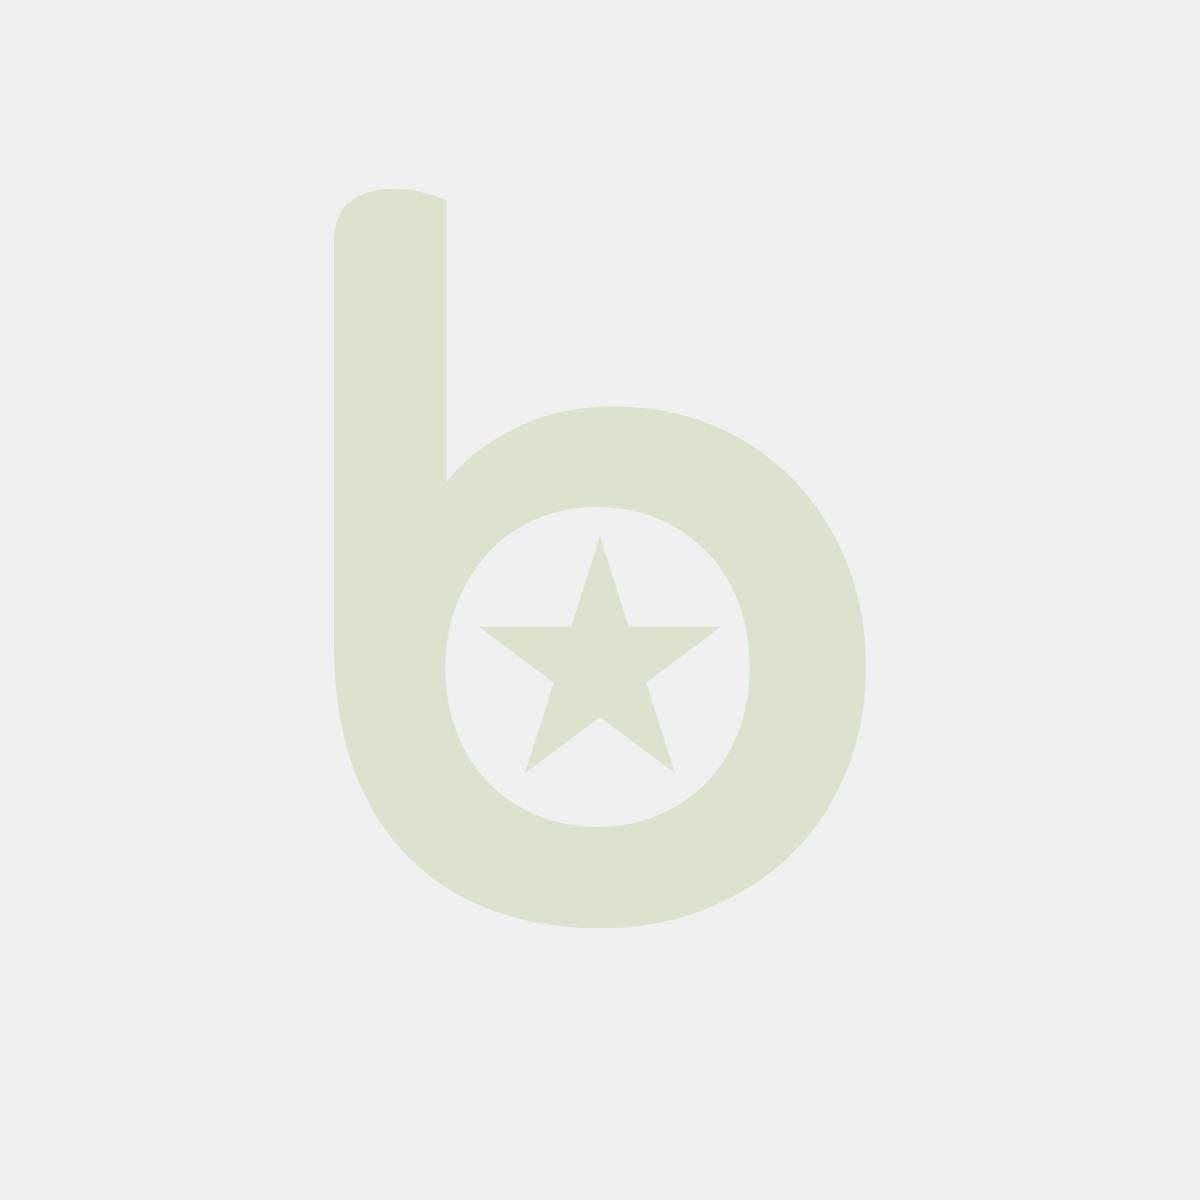 Koperta KEBAB/HAMBURGER foliowana, bez nadruku, cena za opakowanie 200szt